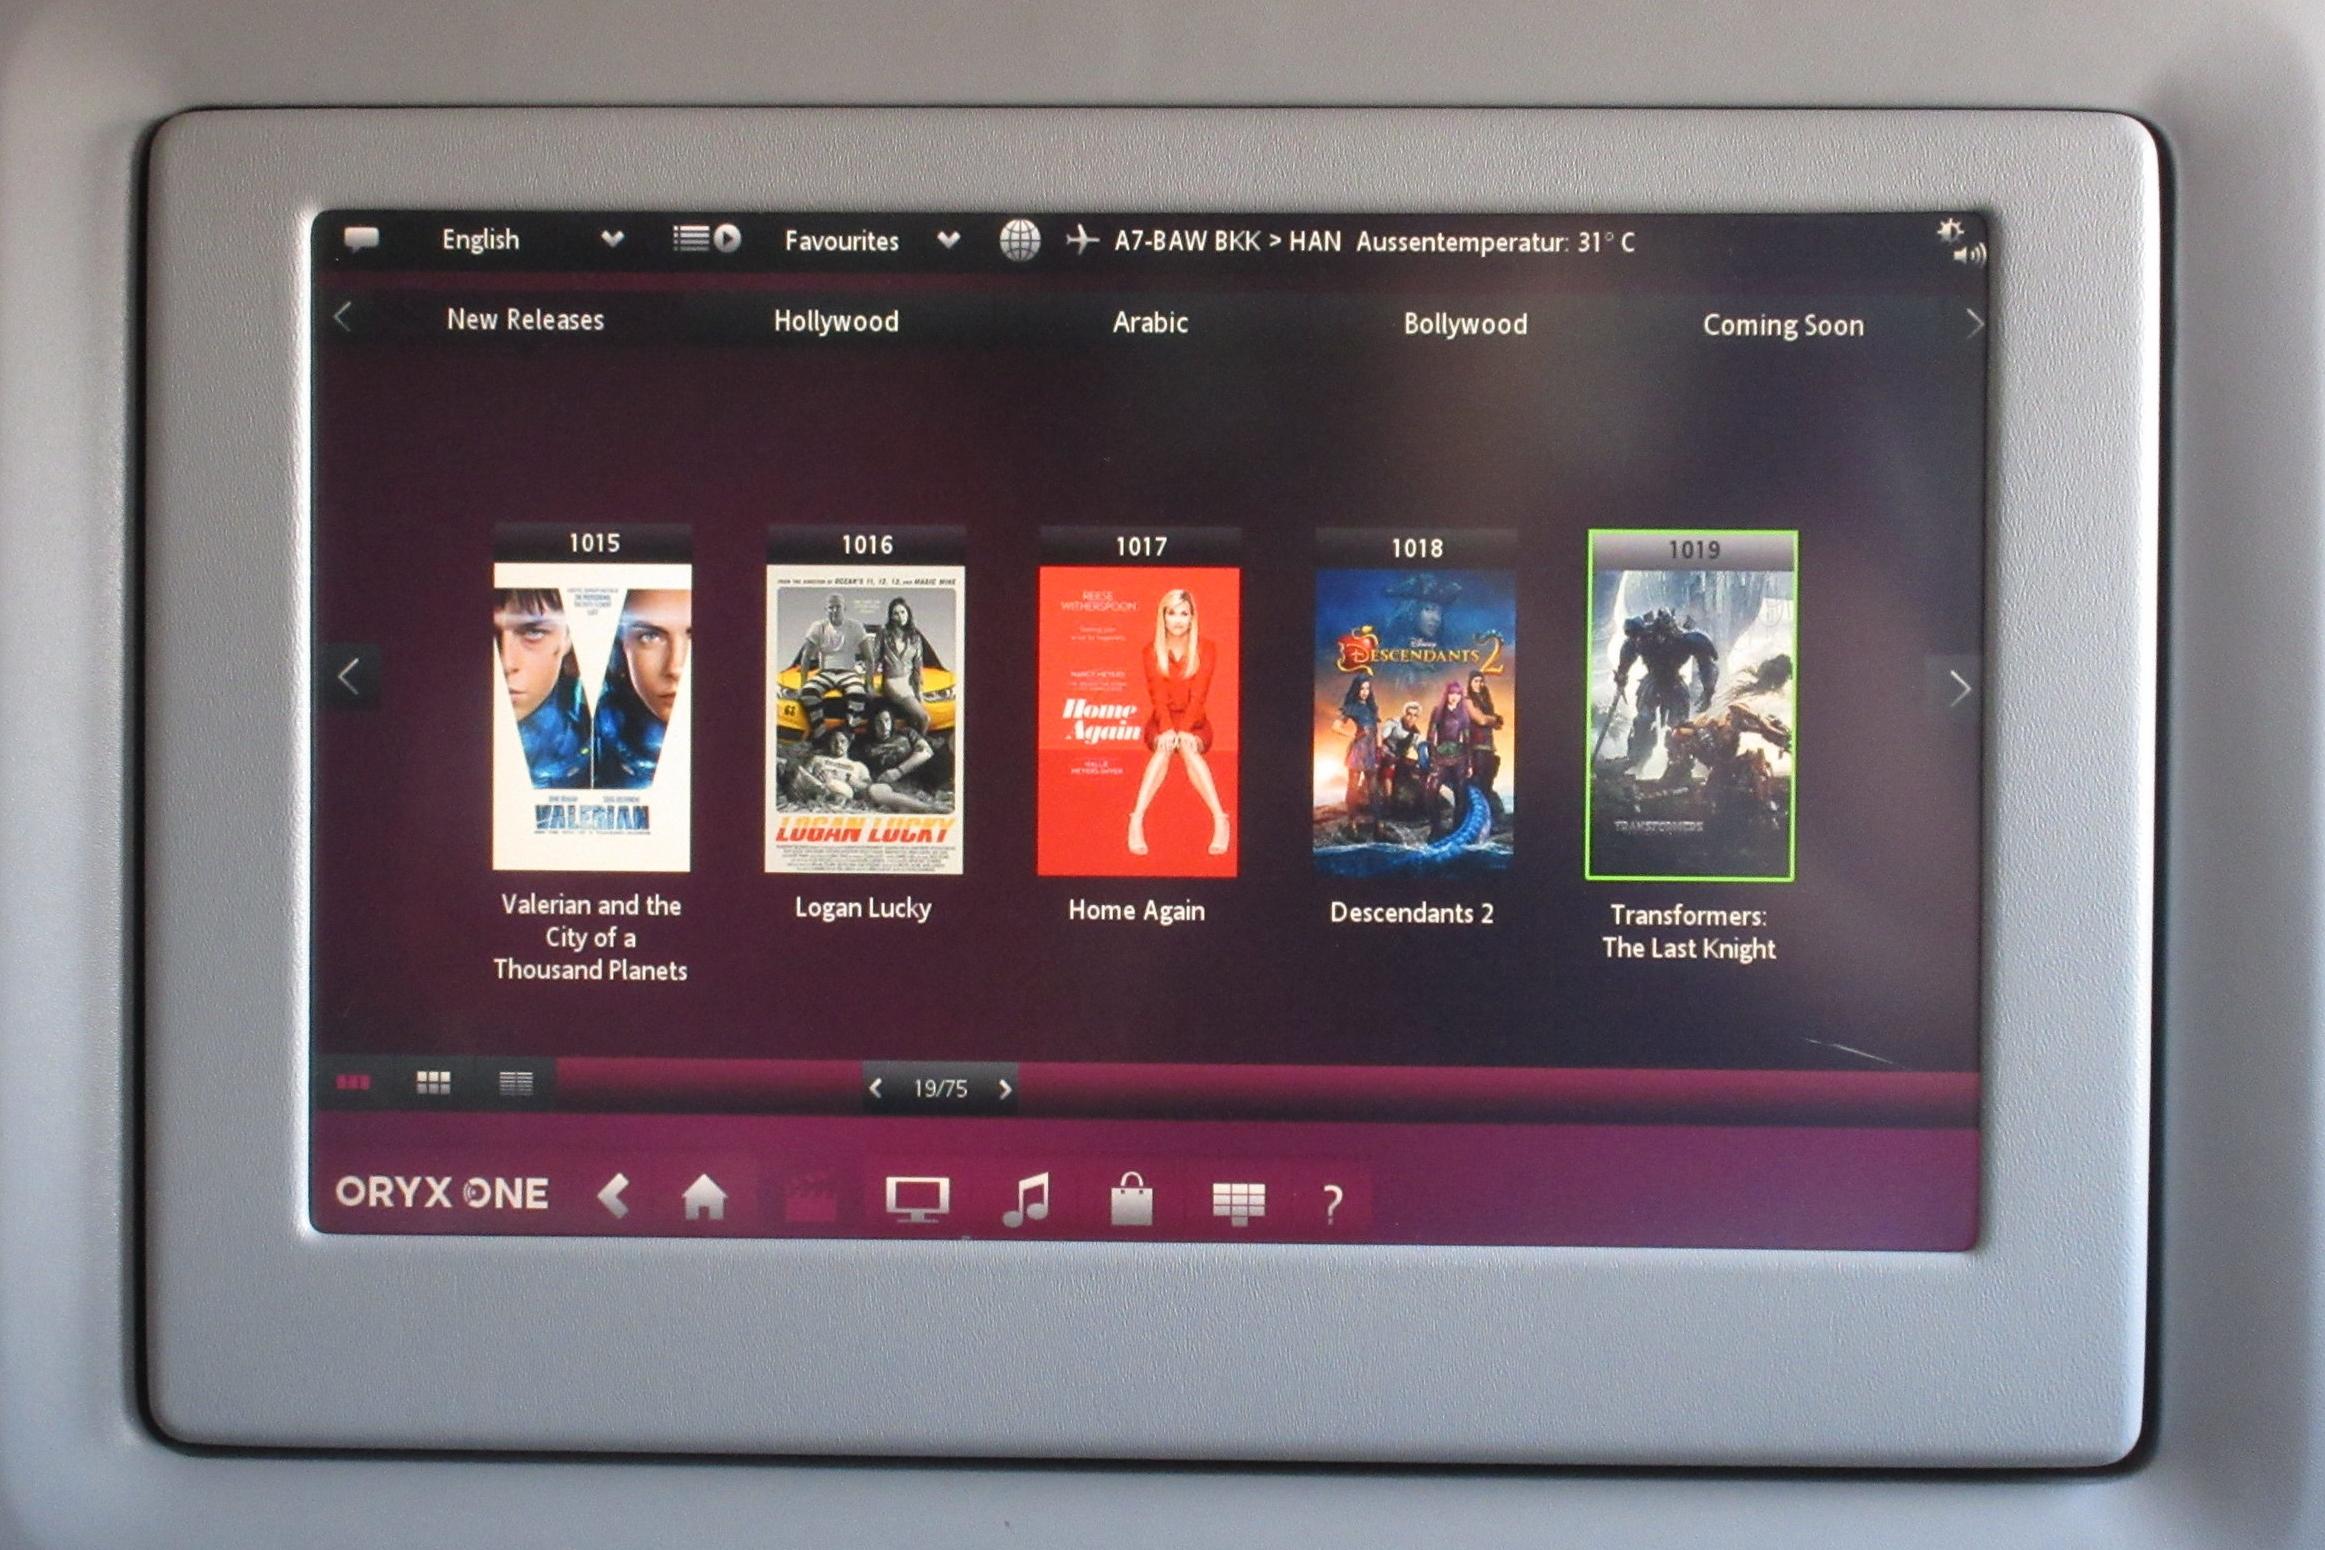 Qatar Airways 777 business class – Movie selection